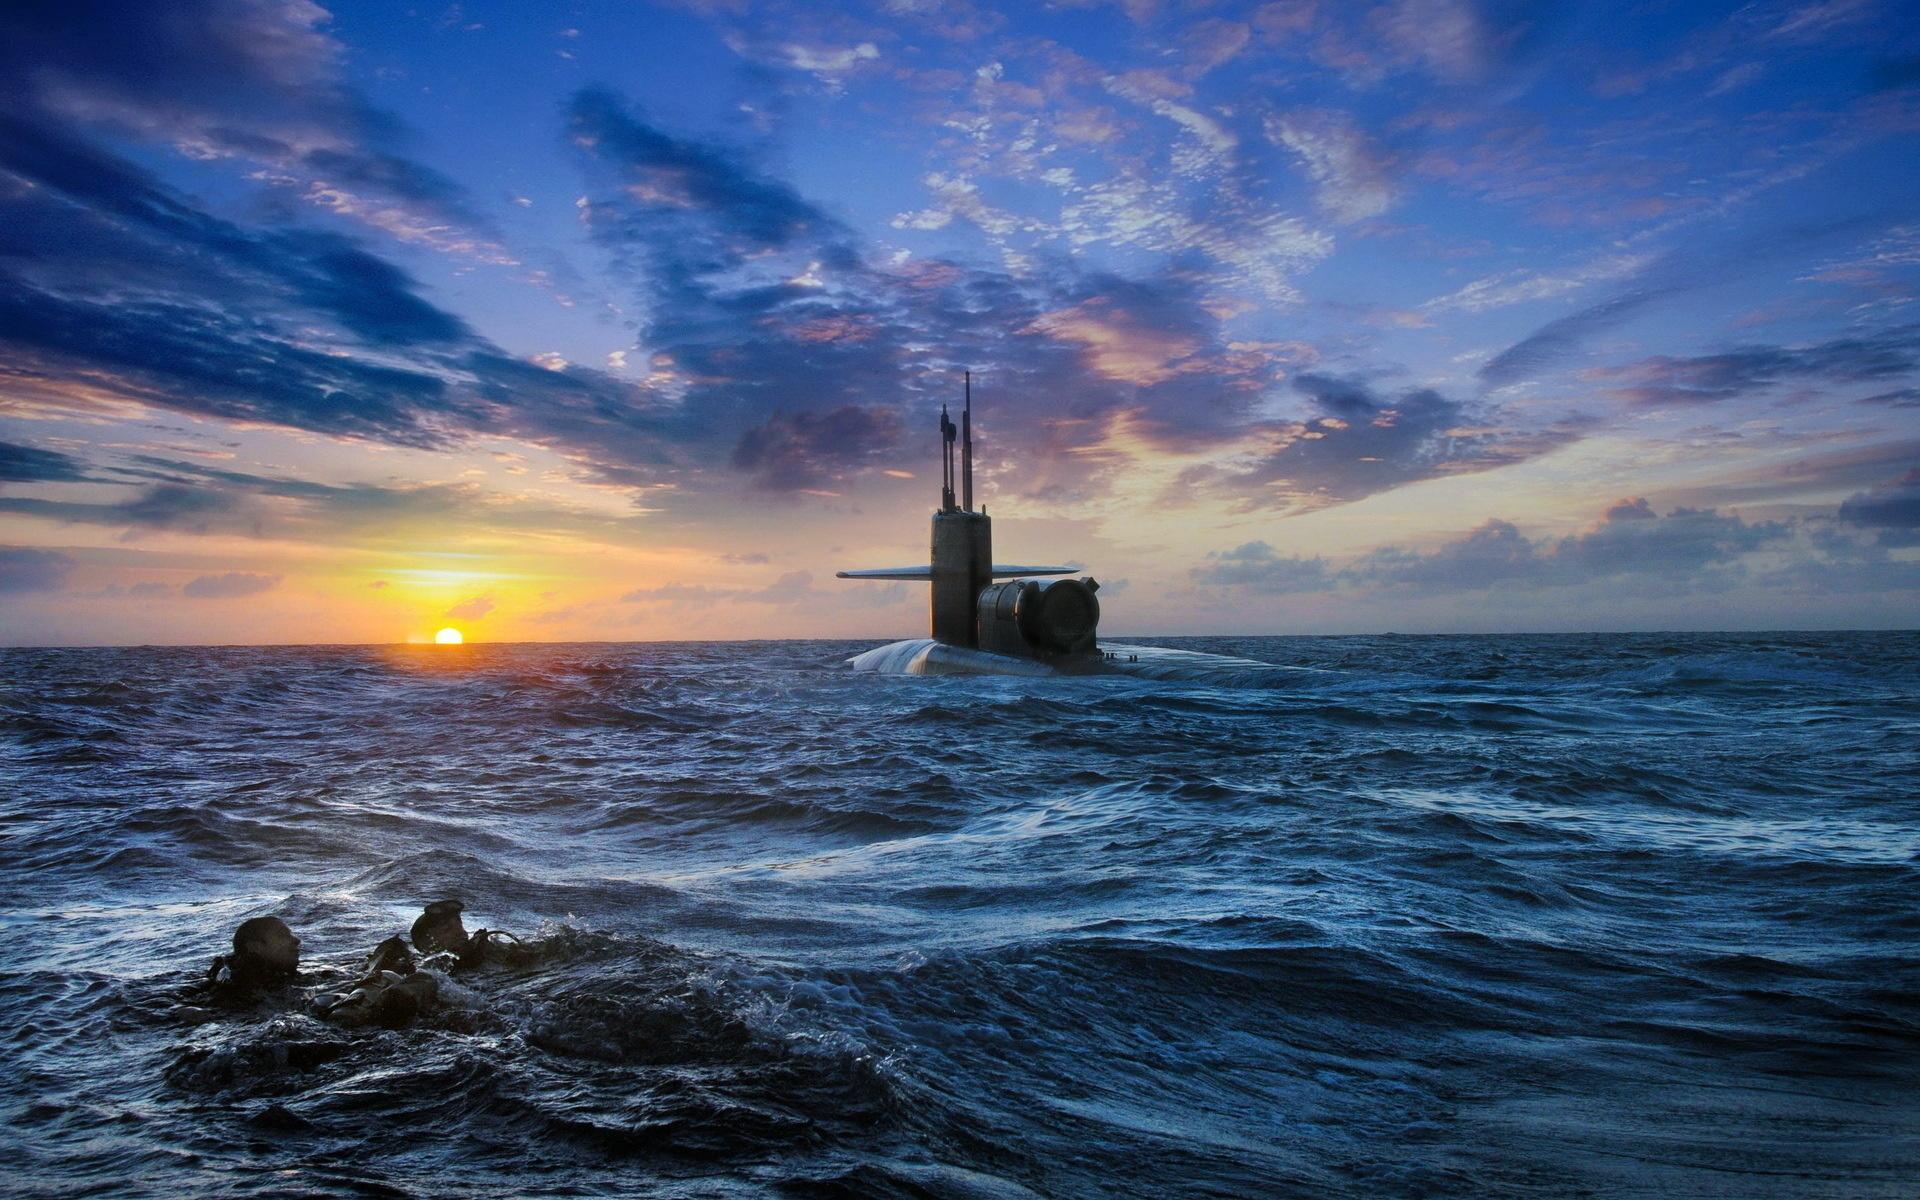 преображению подводная лодка закат в море фото искала